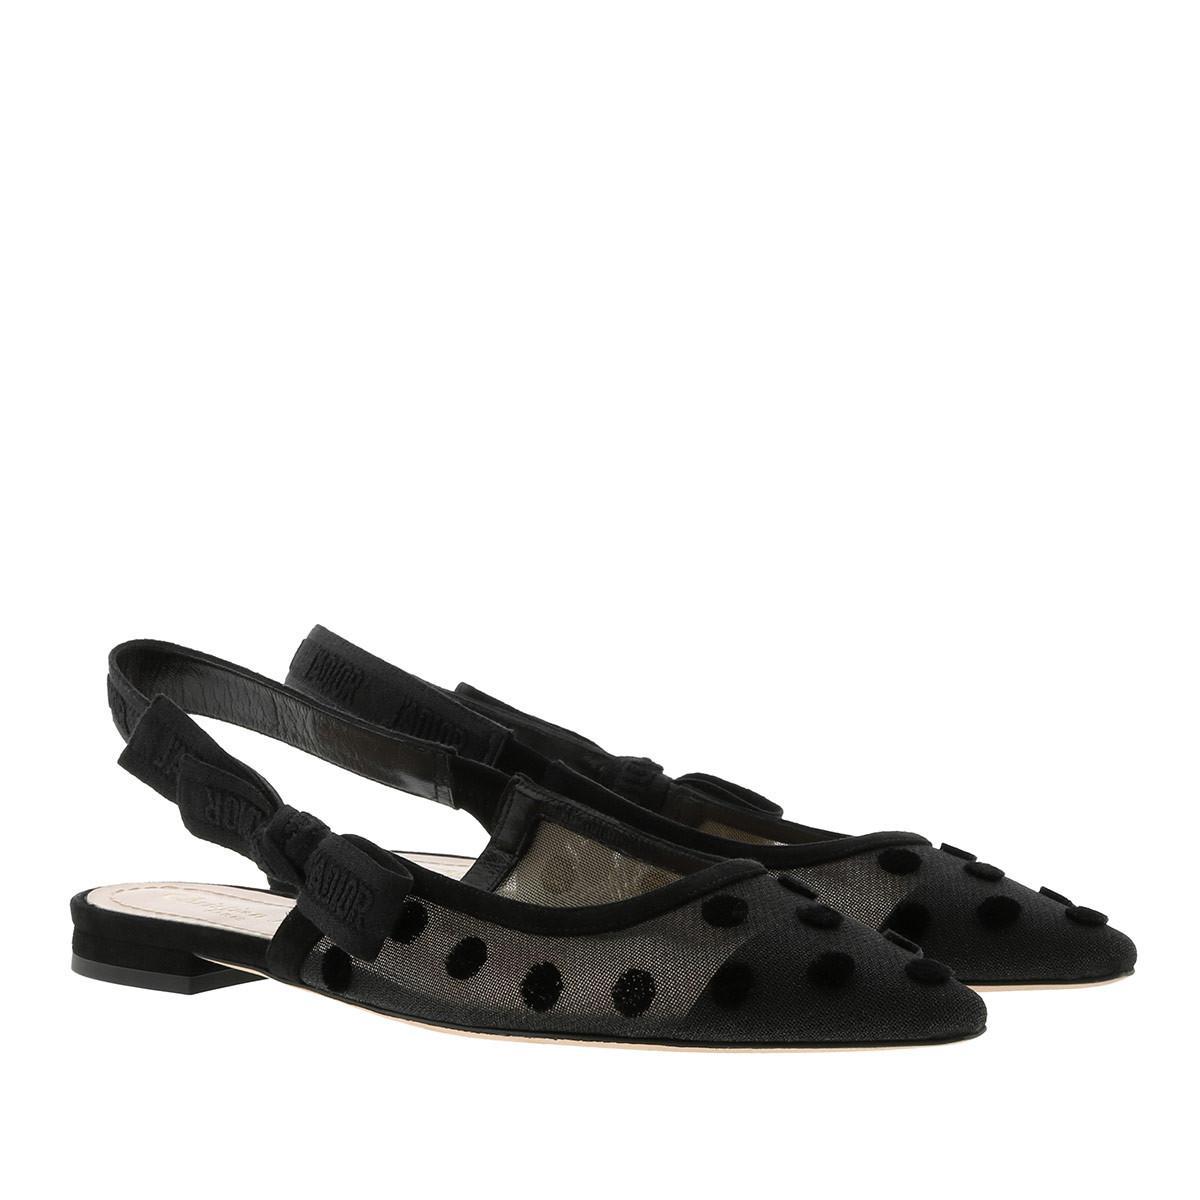 7c728c97c62 Dior Jadior Slingback Flat Pumps Black in Black - Lyst